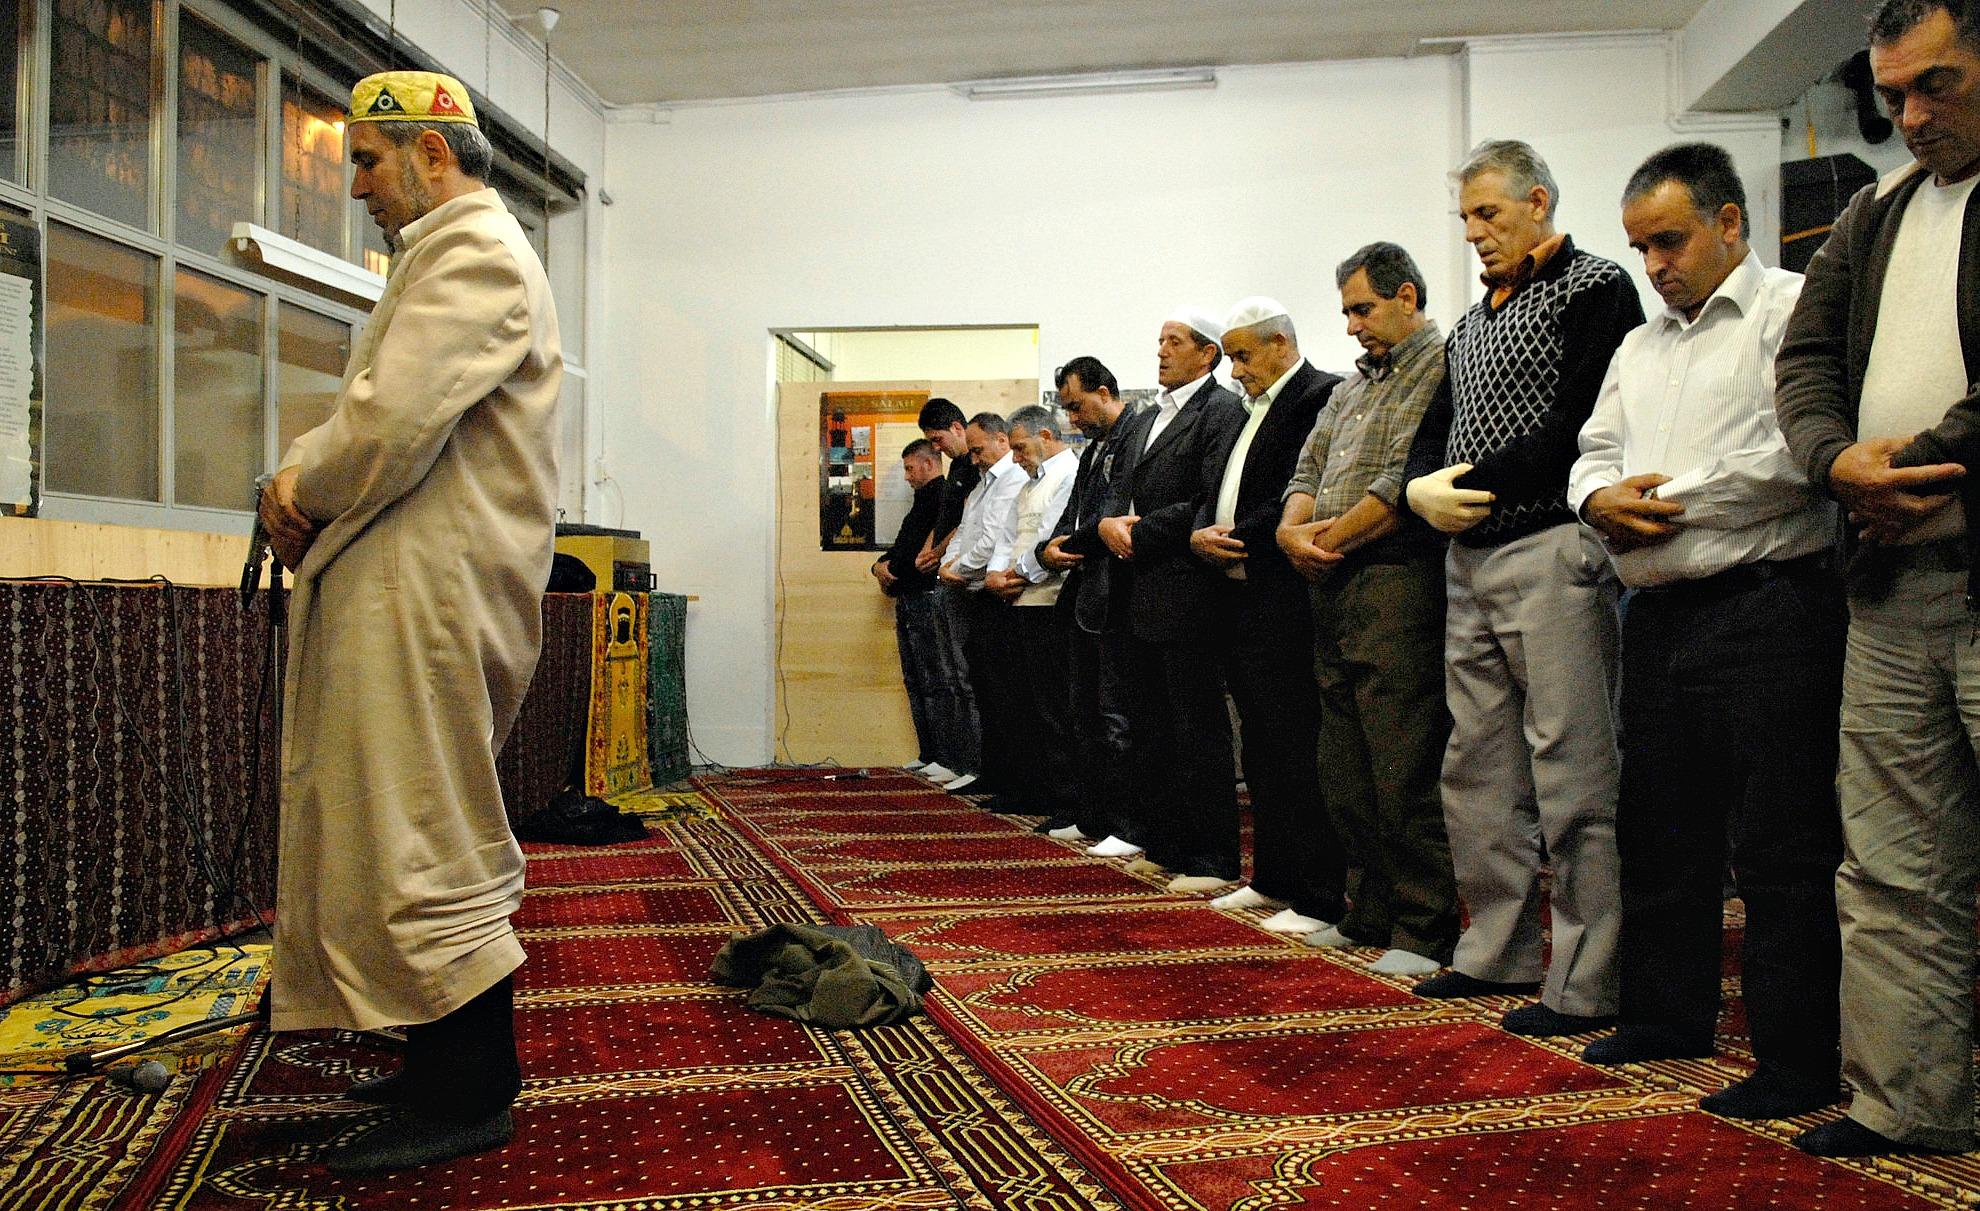 rencontre musulmane suisse